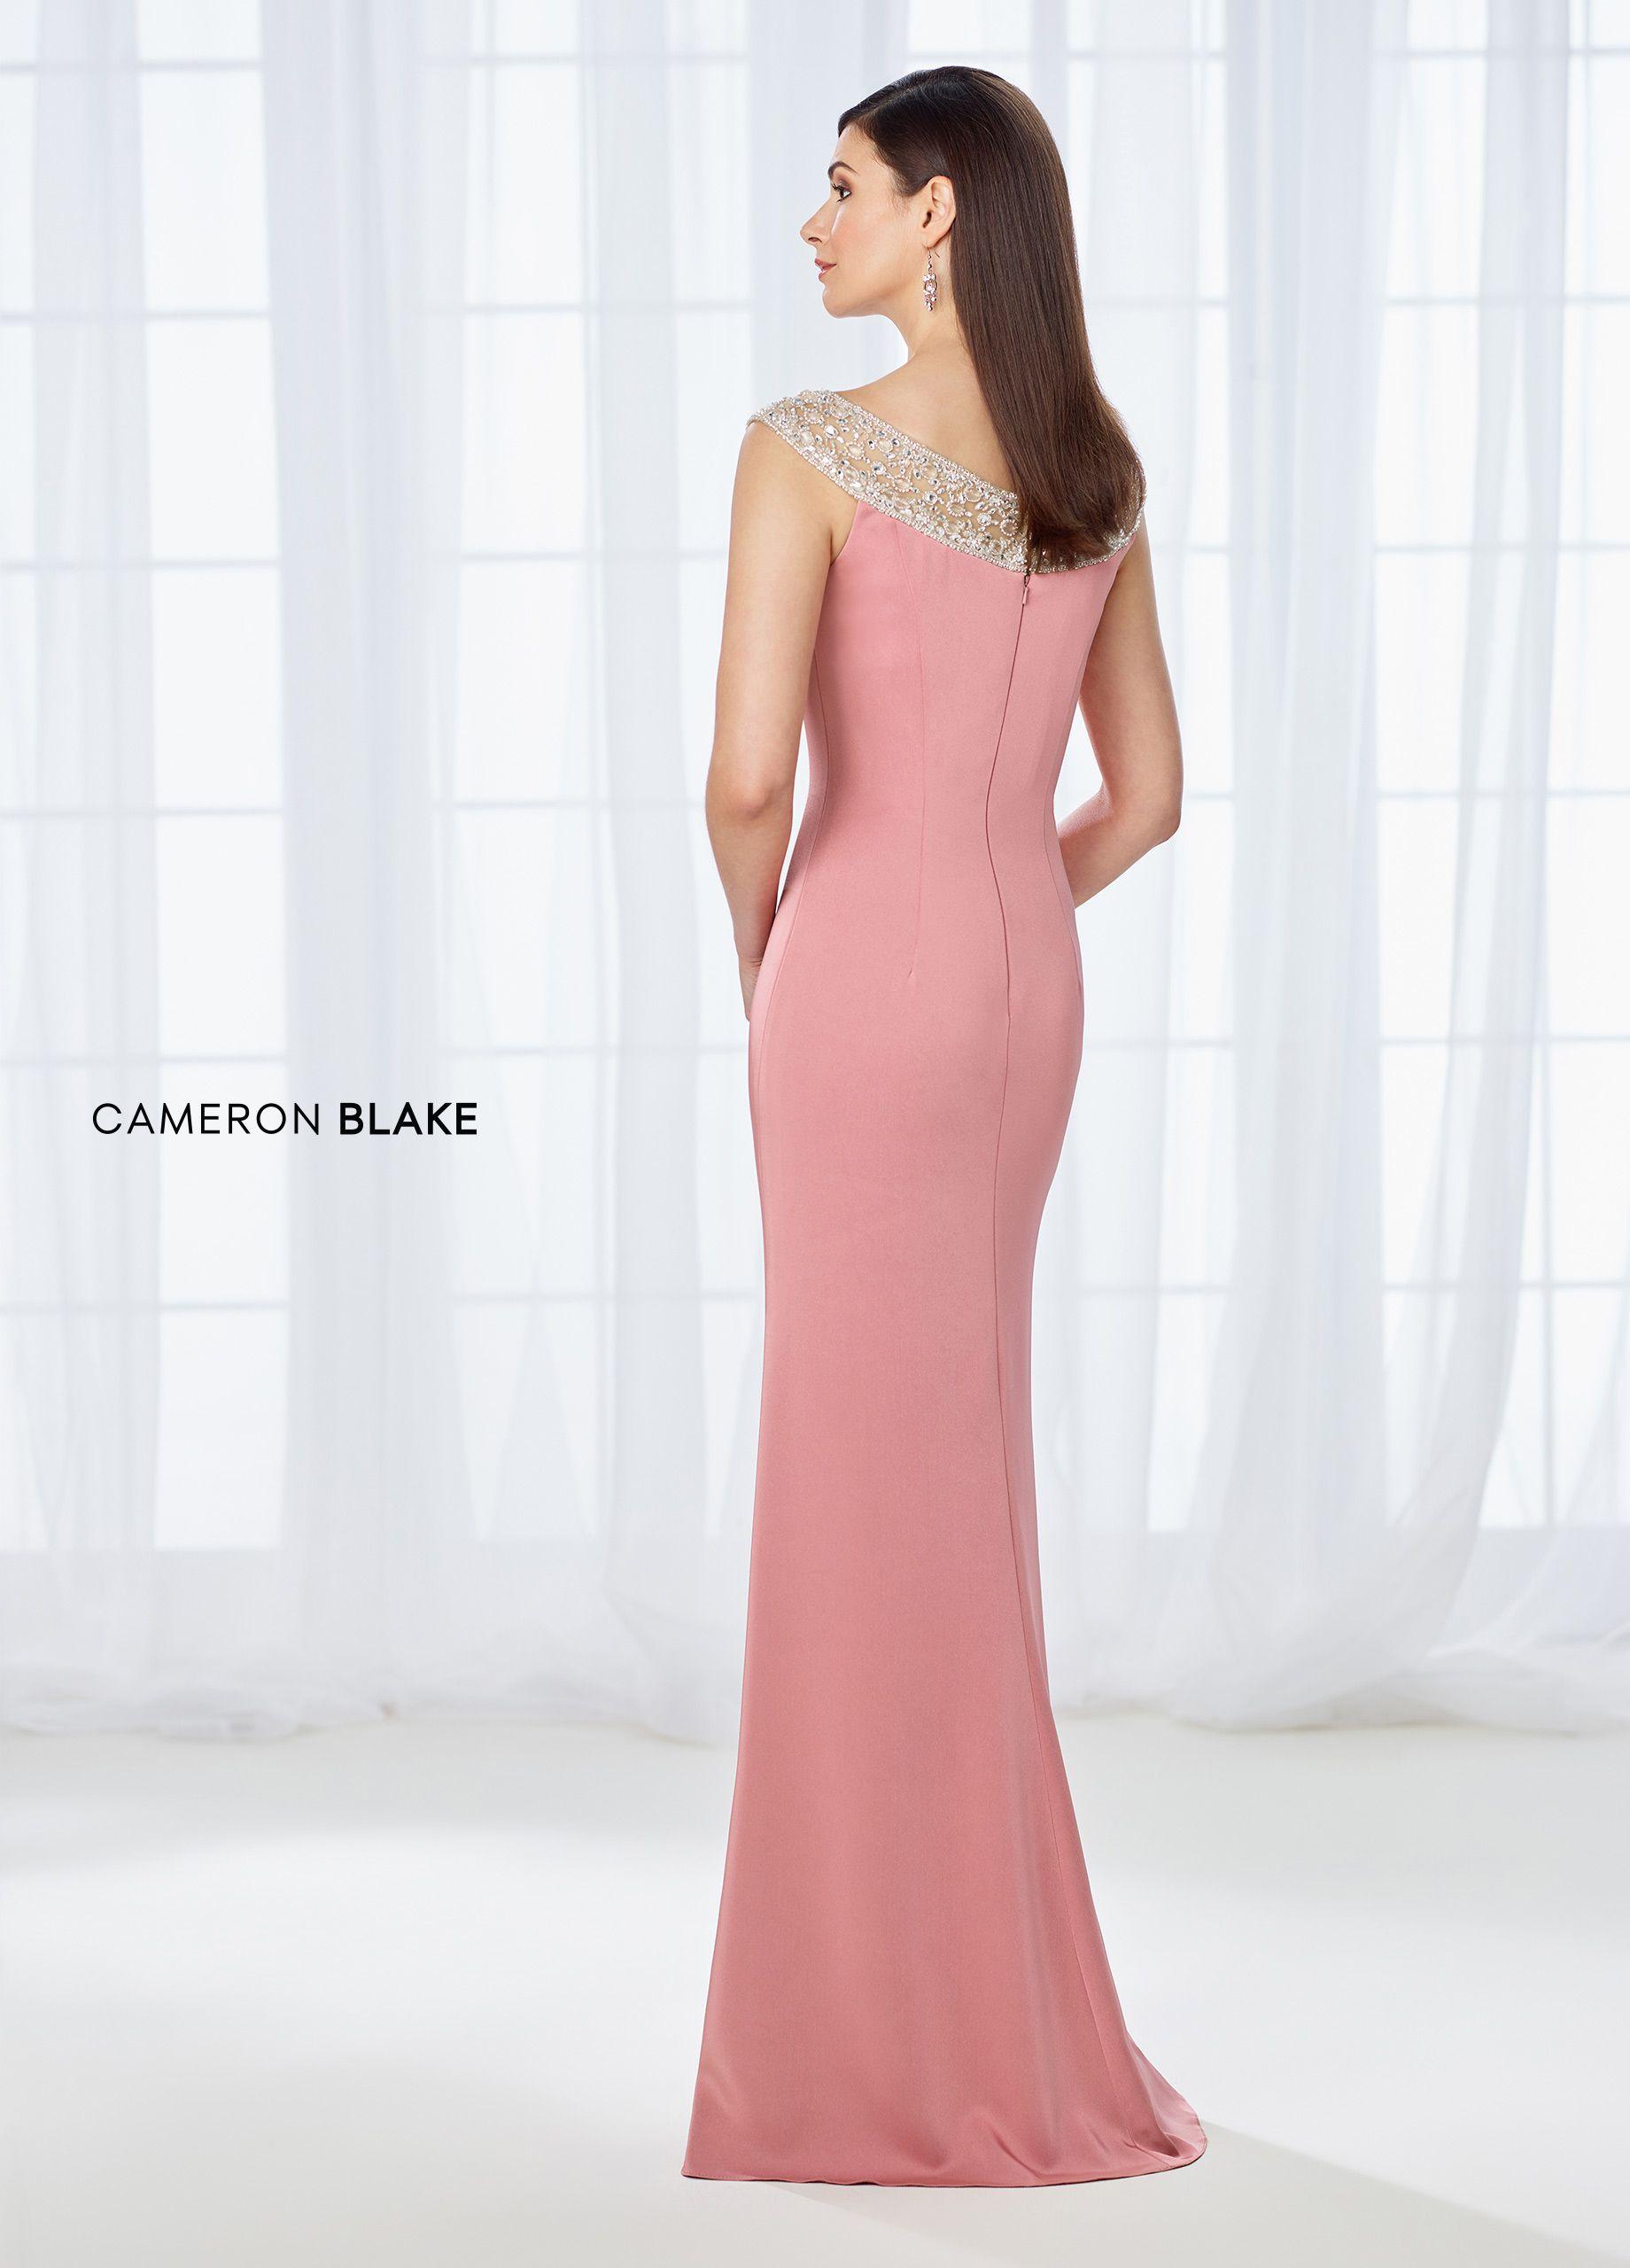 Famoso Vestido De Novia Miami Modelo - Colección de Vestidos de Boda ...